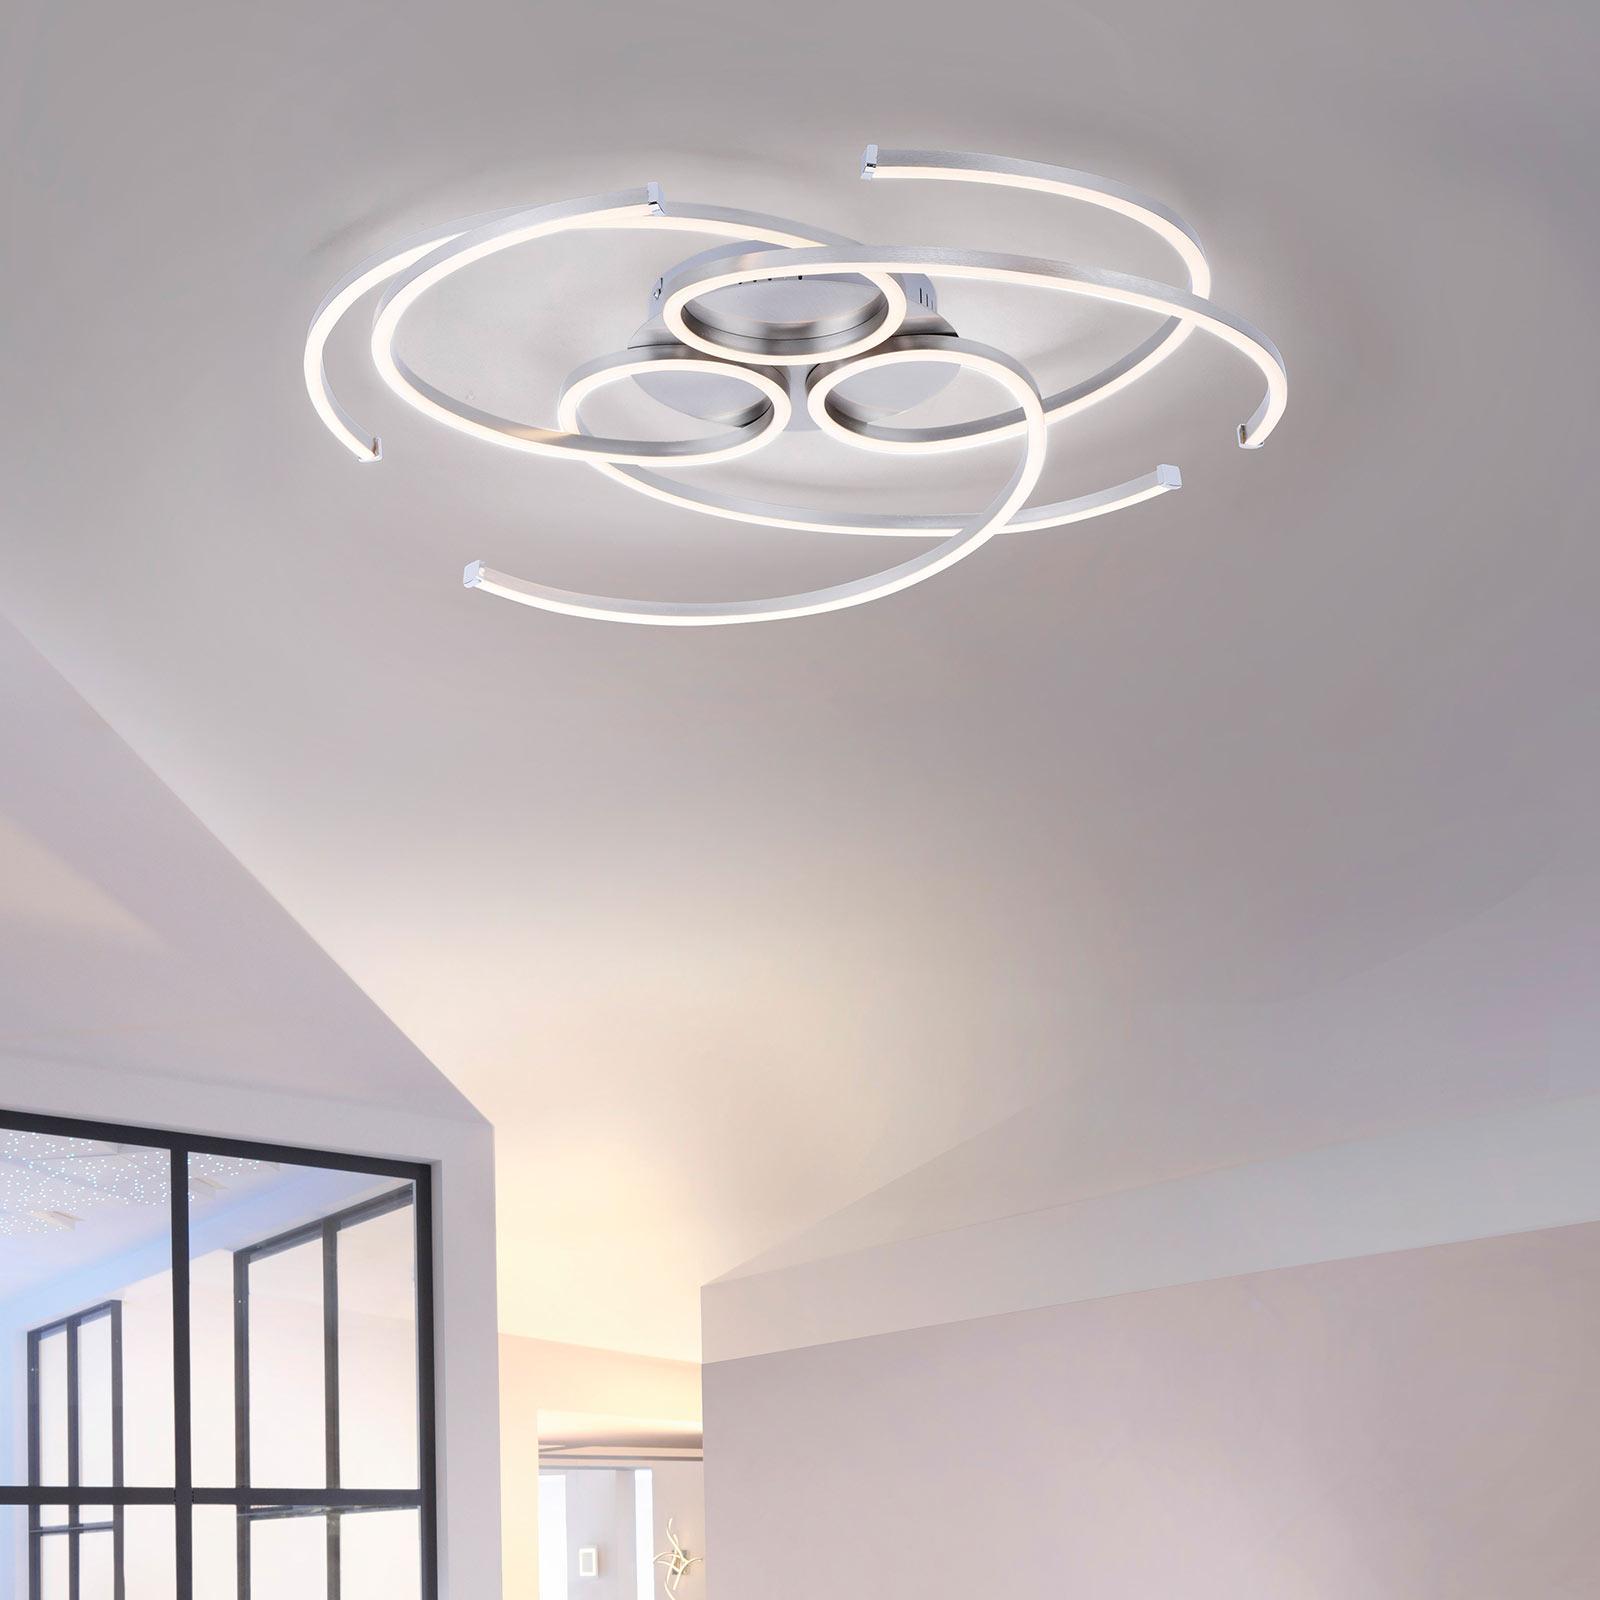 LED-taklampa Danilo, dimbar via väggbrytare